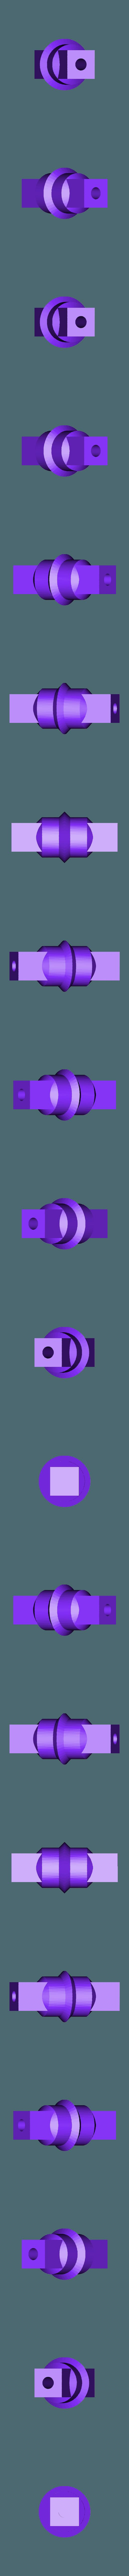 TruckV3_Axle2_rear_pinion_gear.STL Download STL file 3D Printed RC Truck V3 • 3D print model, MrCrankyface